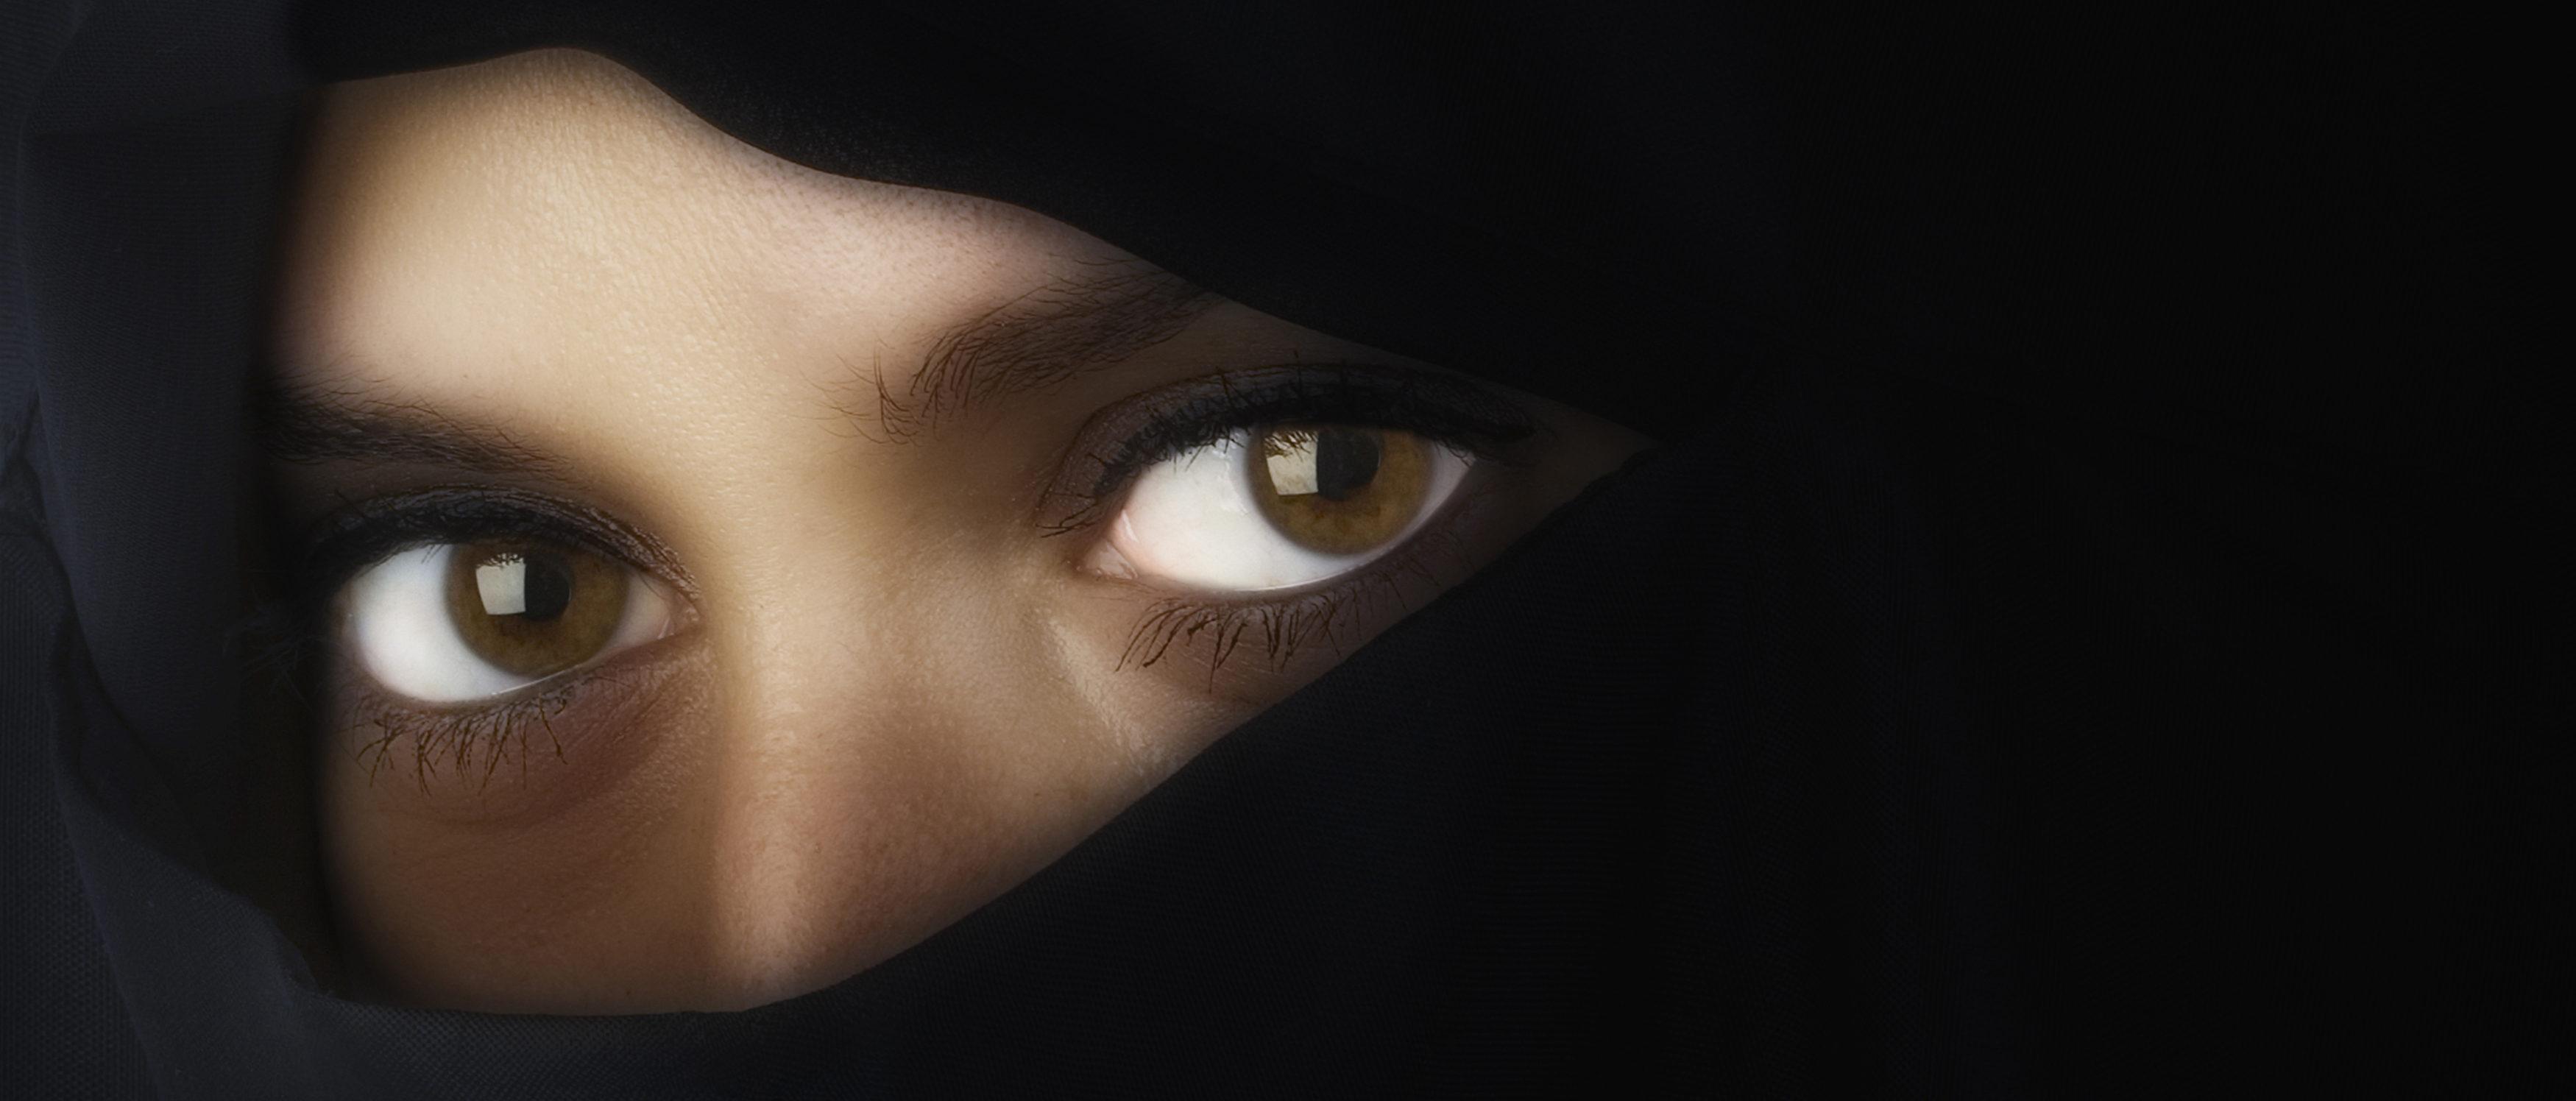 Sri Lanka Bans Burqas Shutterstock kbrowne41